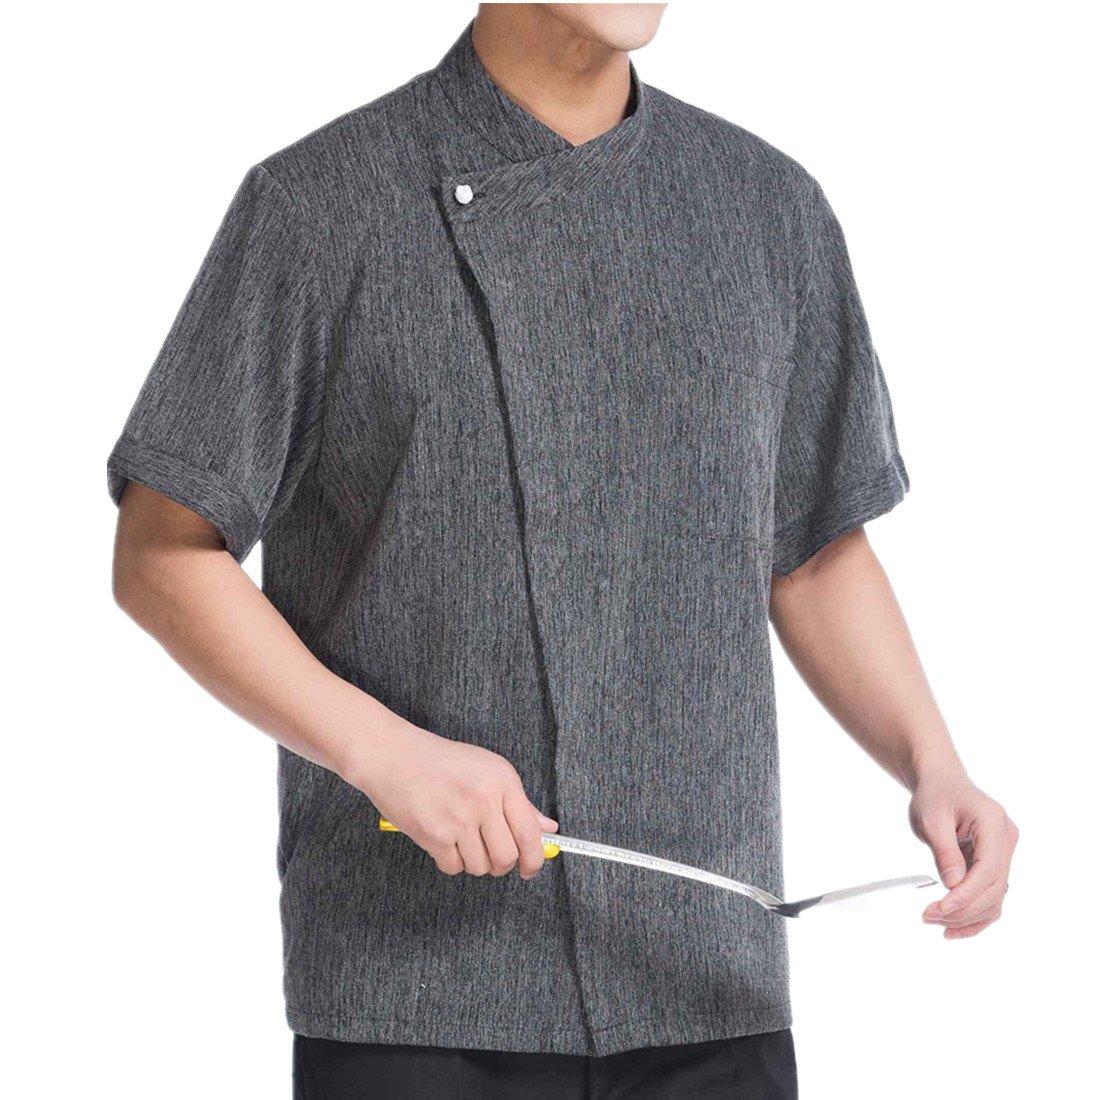 WAIWAIZUI Linen Chef Jackets Waiter Coat Short Sleeves (US: L (Label:XXL)) by WAIWAIZUI